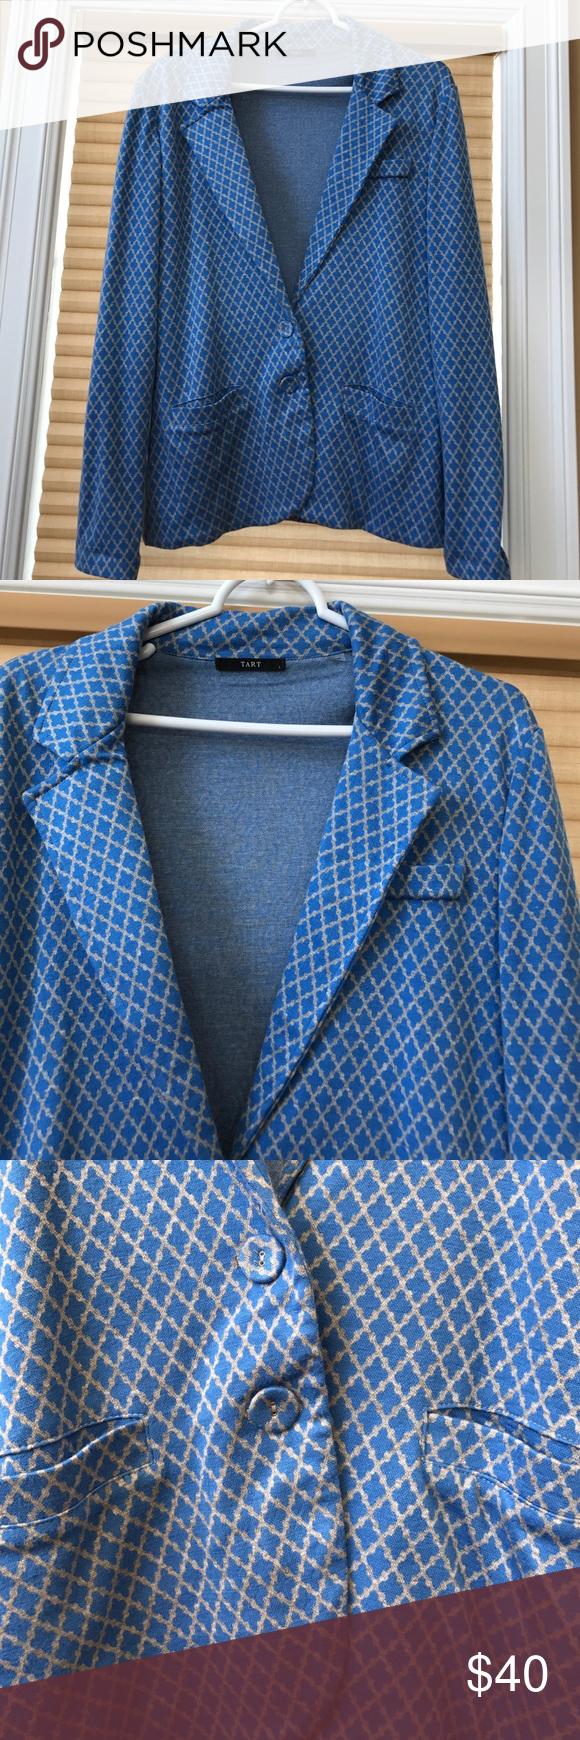 Tart Blazer Large- Rayon/Polyester/Spandex Tart Jackets & Coats Blazers